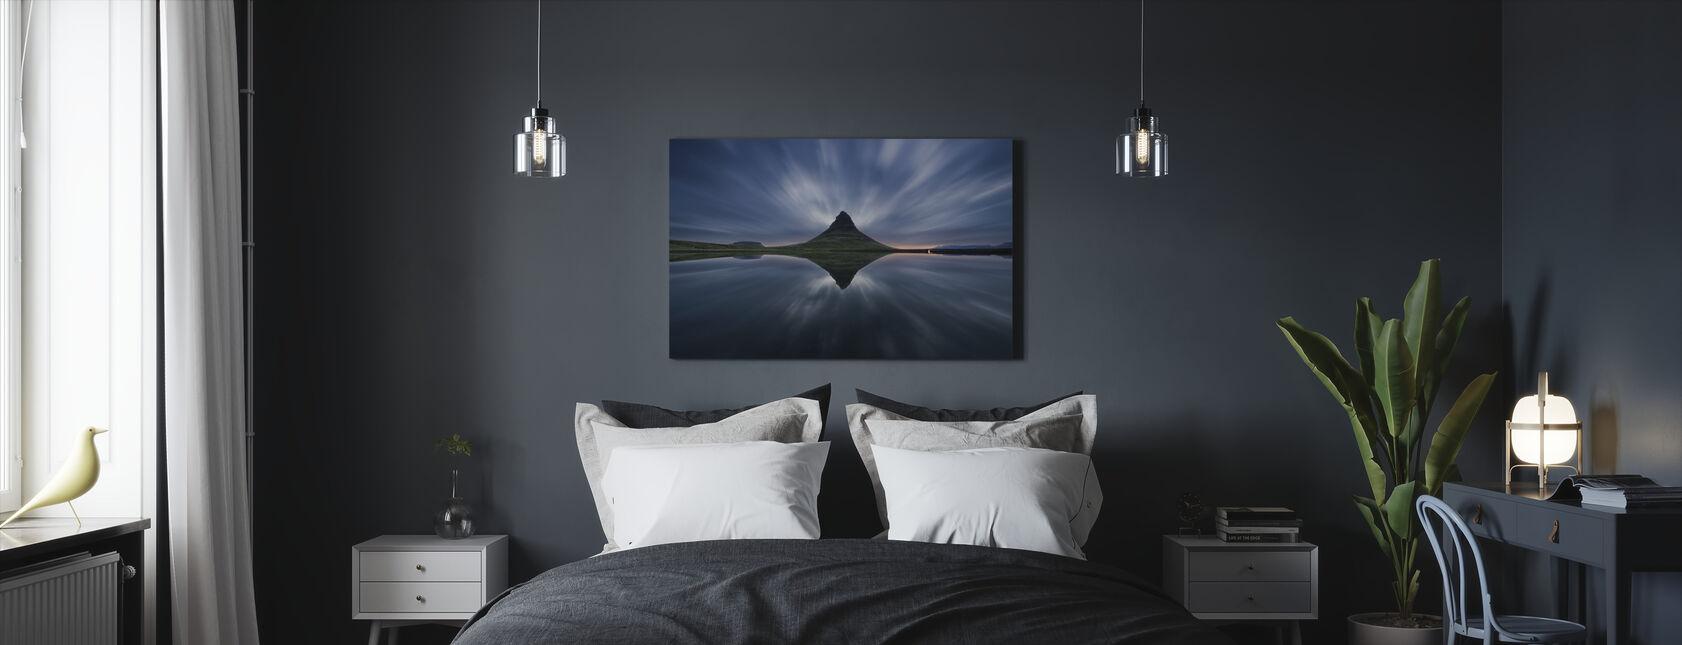 Kirkufjell - Obraz na płótnie - Sypialnia